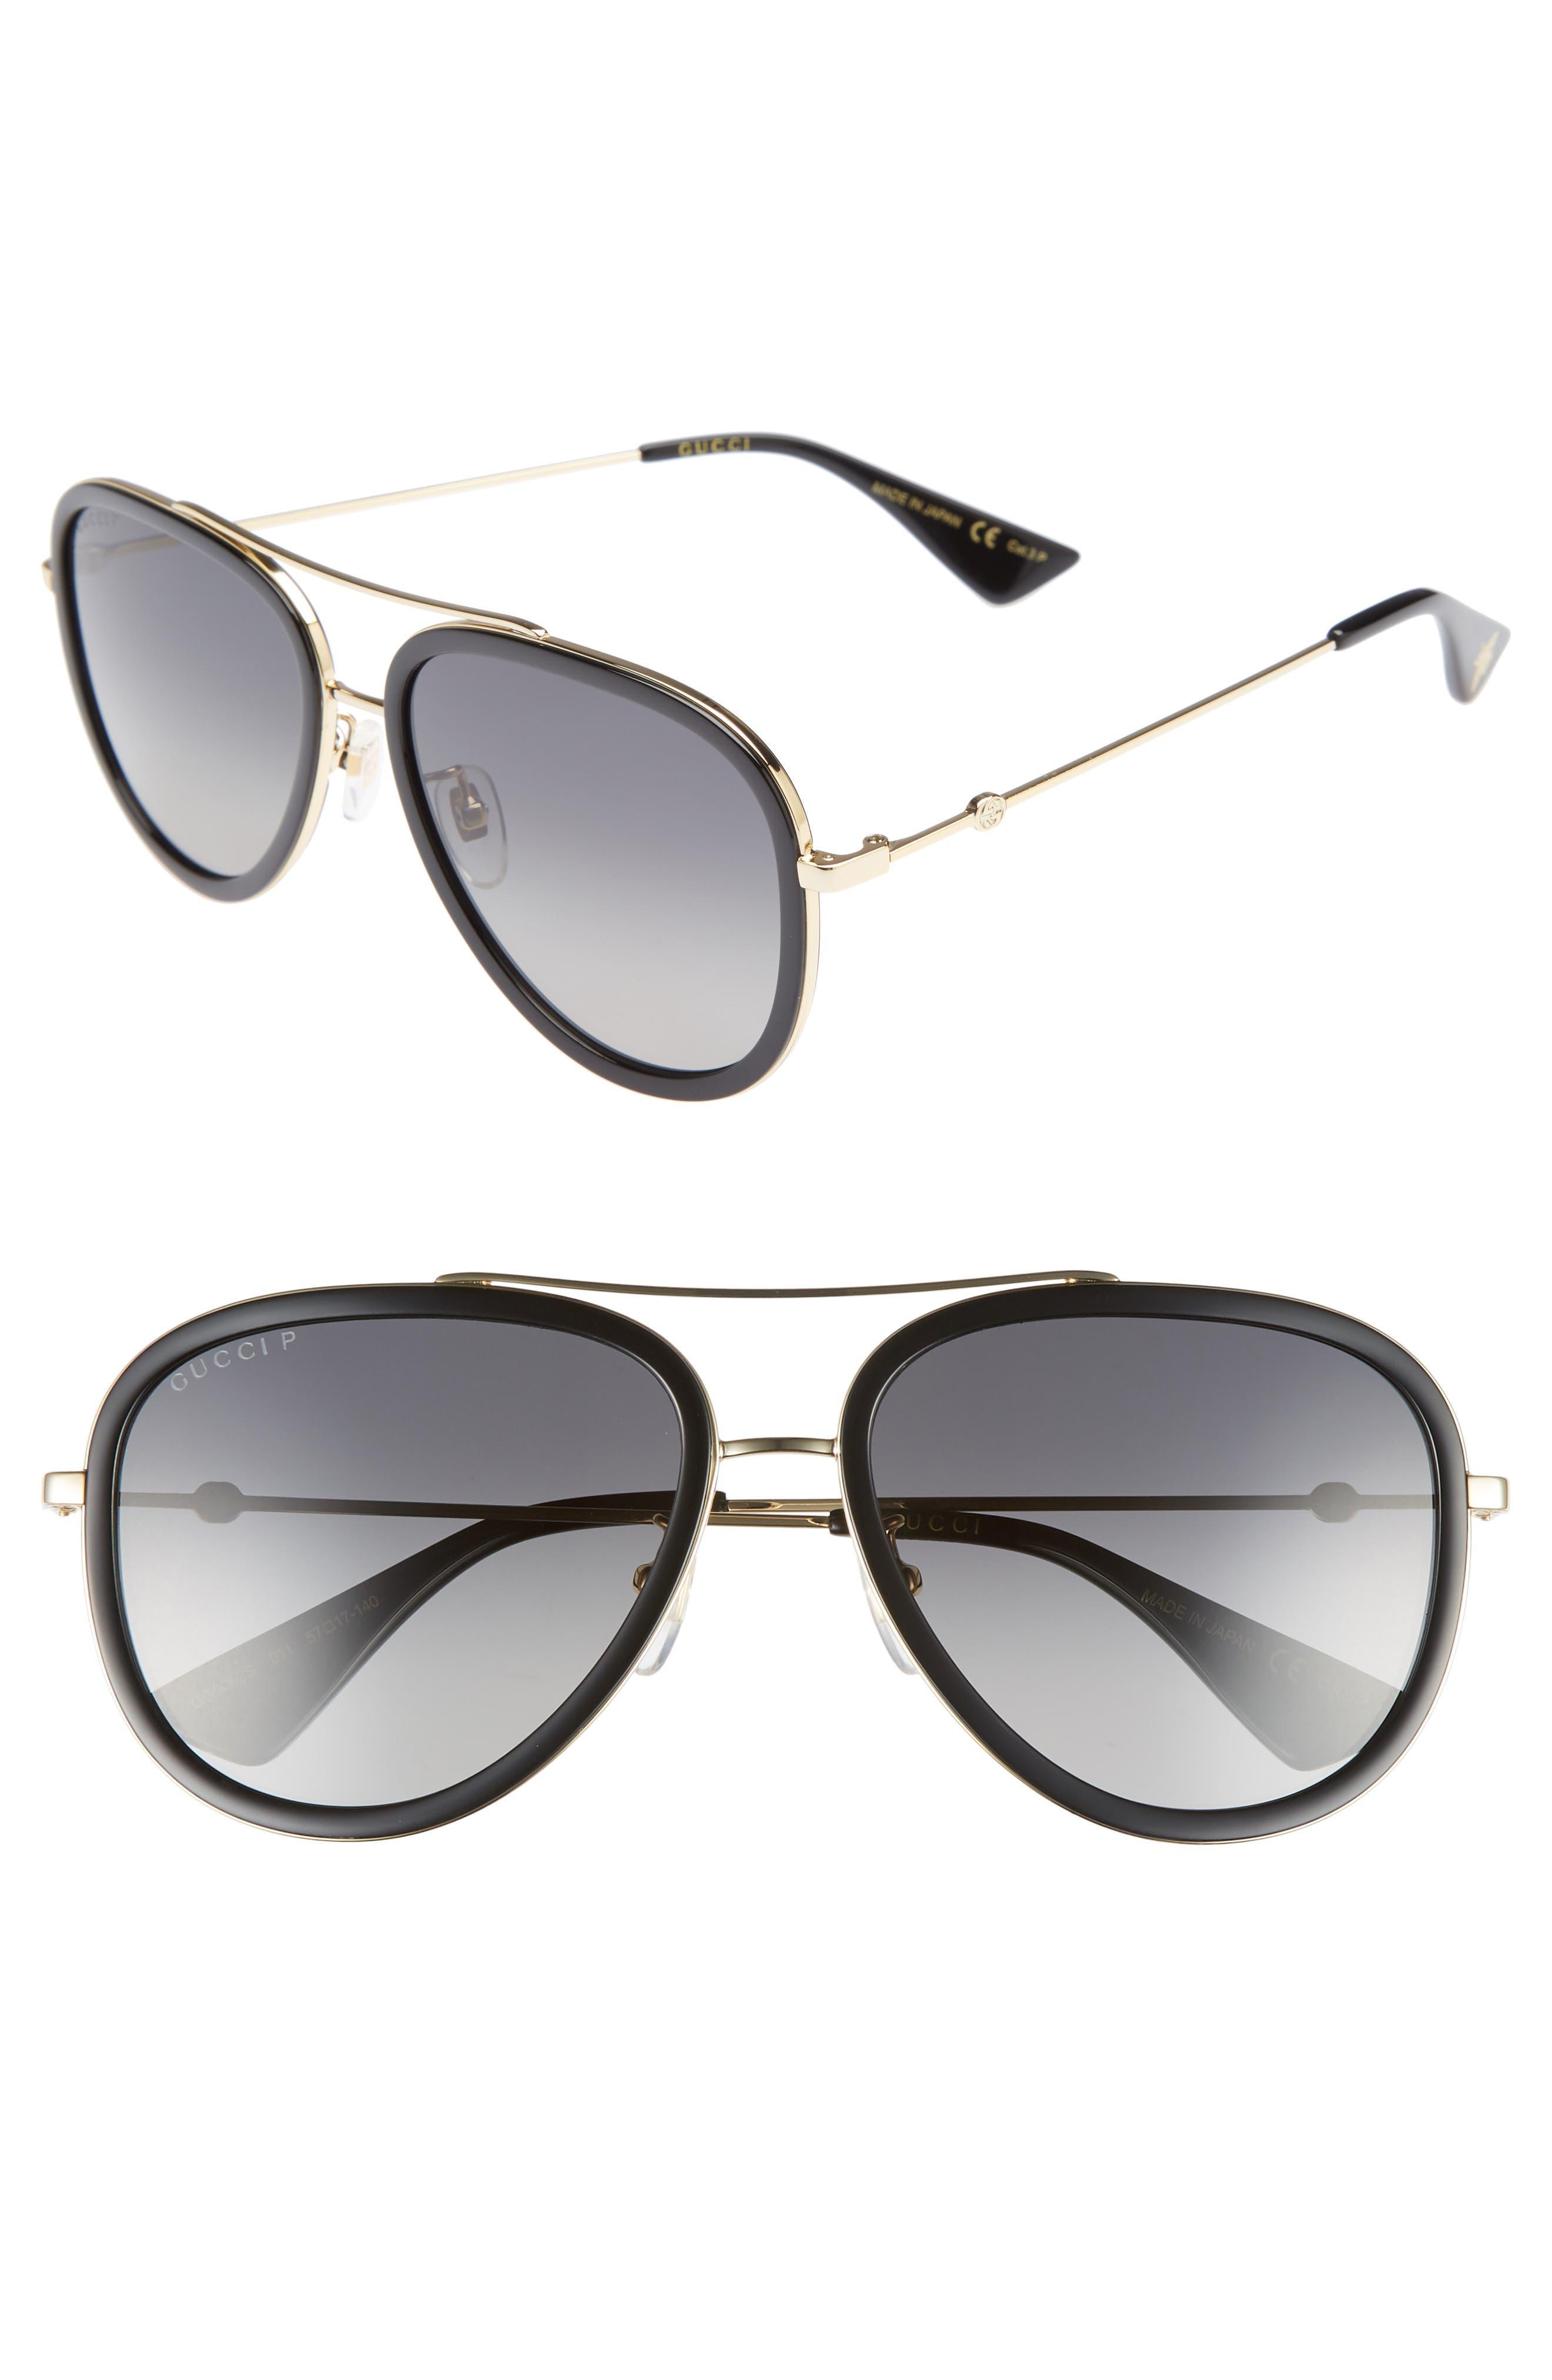 GUCCI, 57mm Polarized Metal Aviator Sunglasses, Main thumbnail 1, color, 710